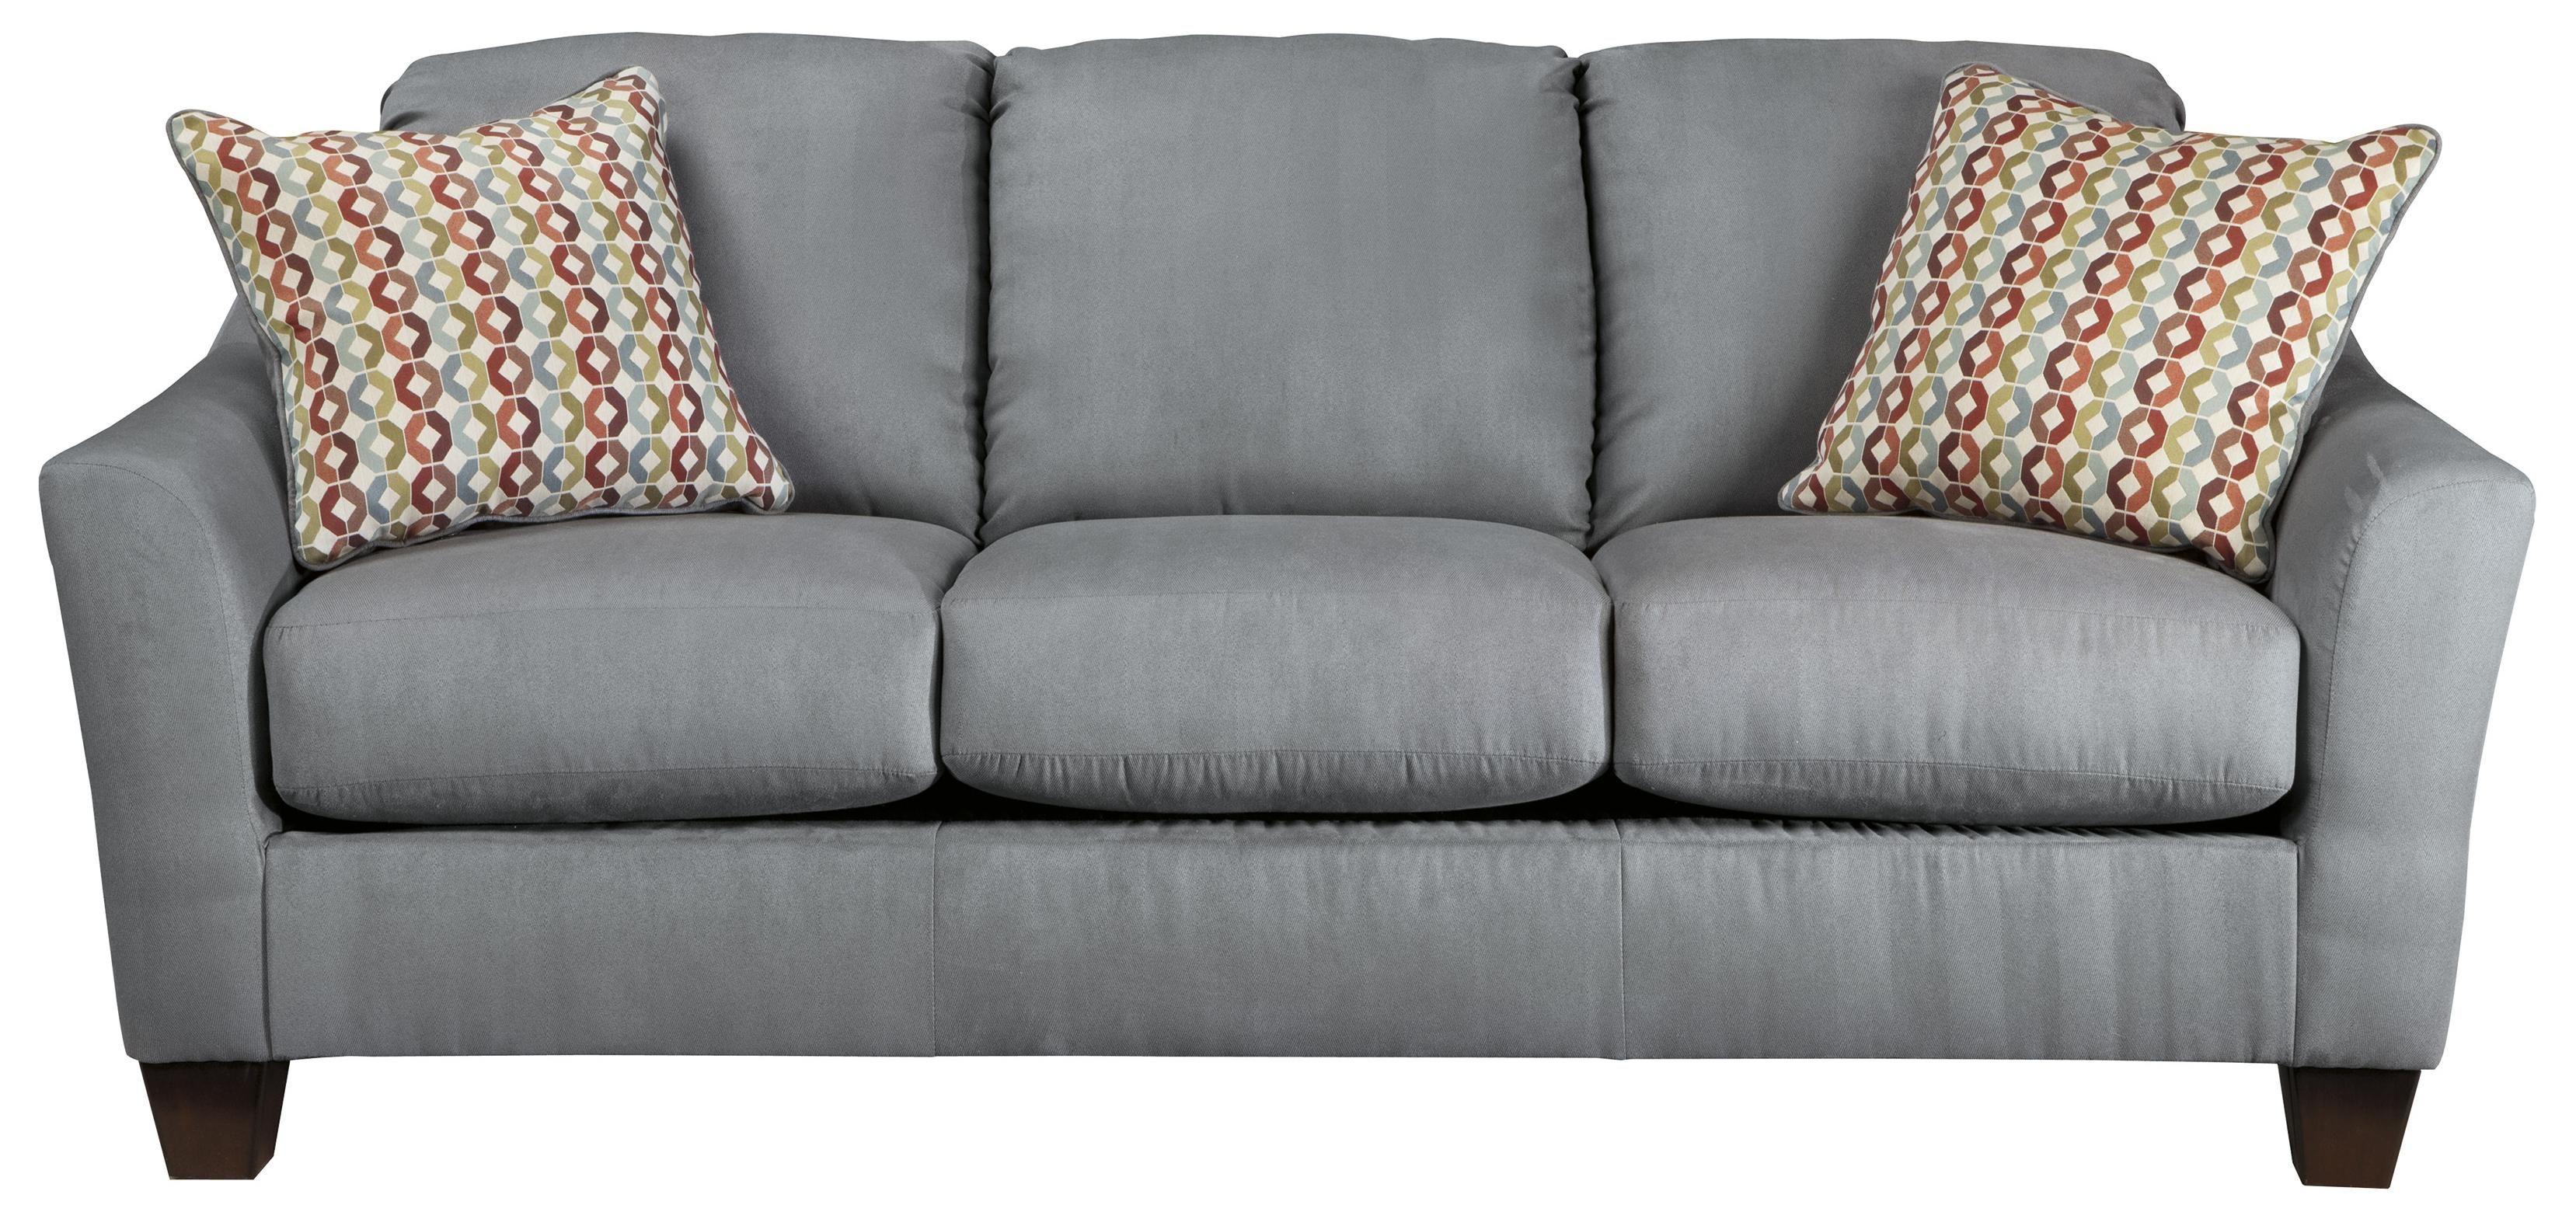 Stupendous Hannin Lagoon Queen Sofa Sleeper By Signature Design By Interior Design Ideas Gentotthenellocom